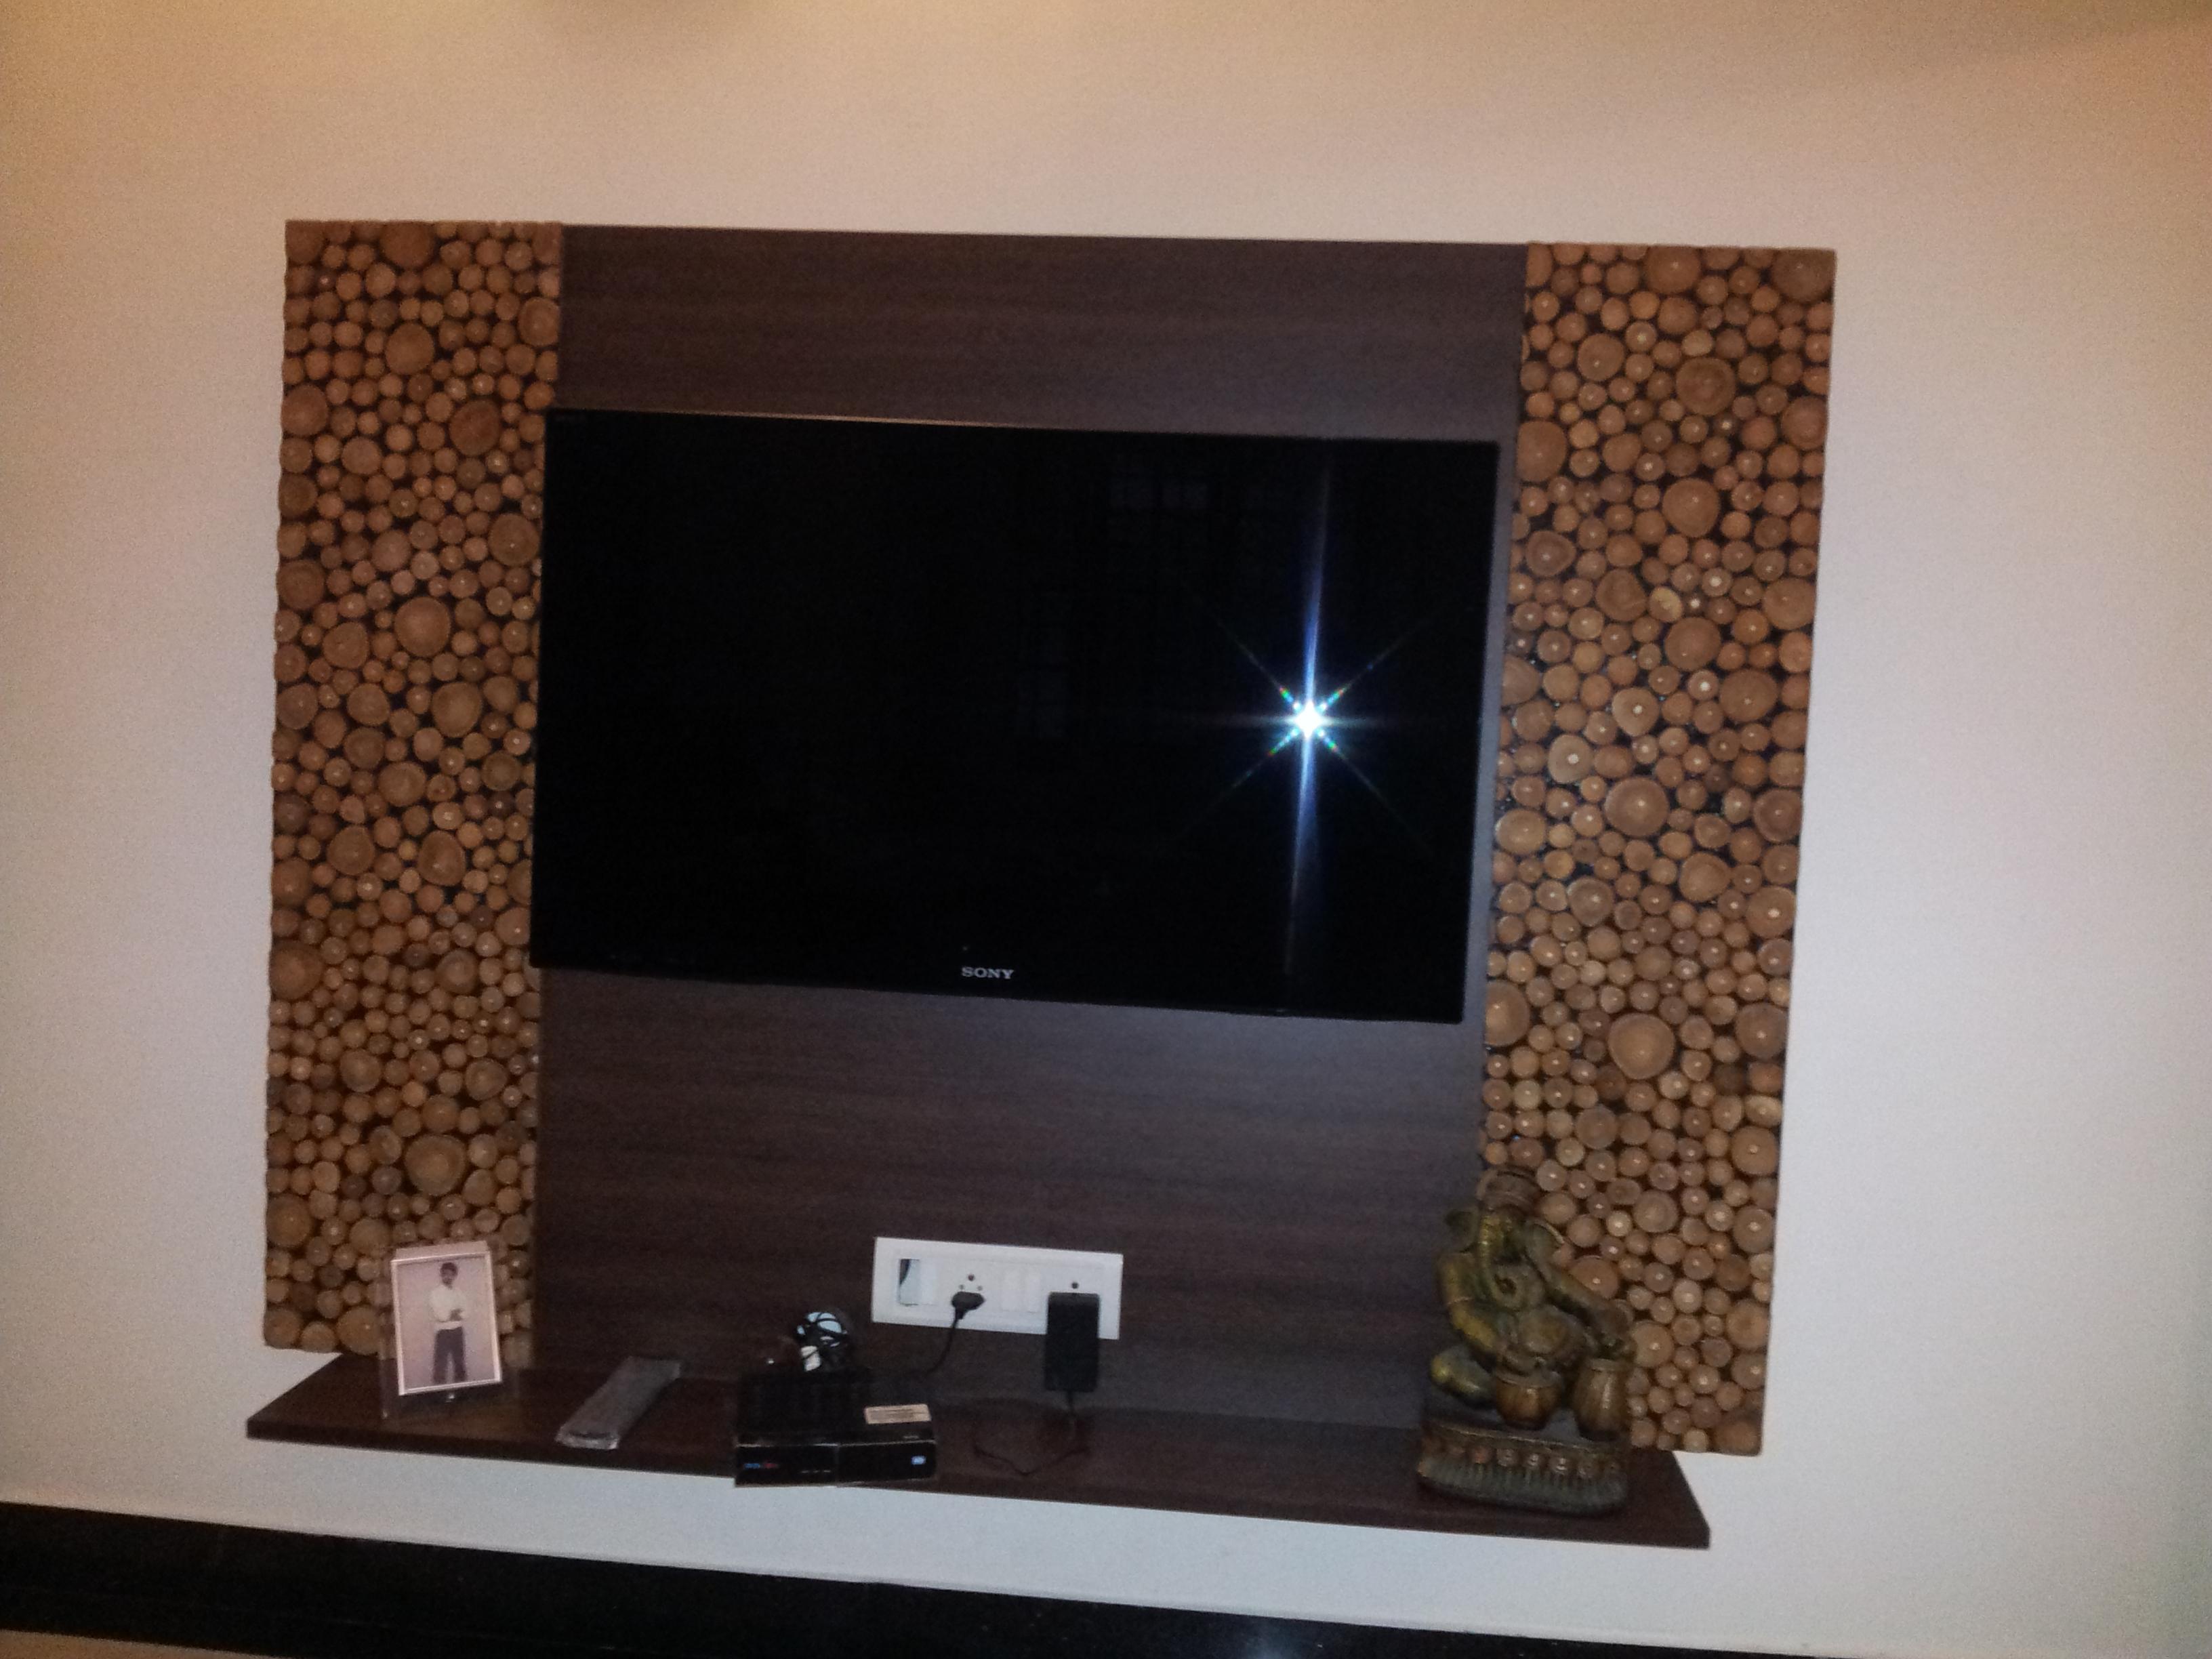 Led Tv Wall Furniture Design   Getpaidforphotos.com